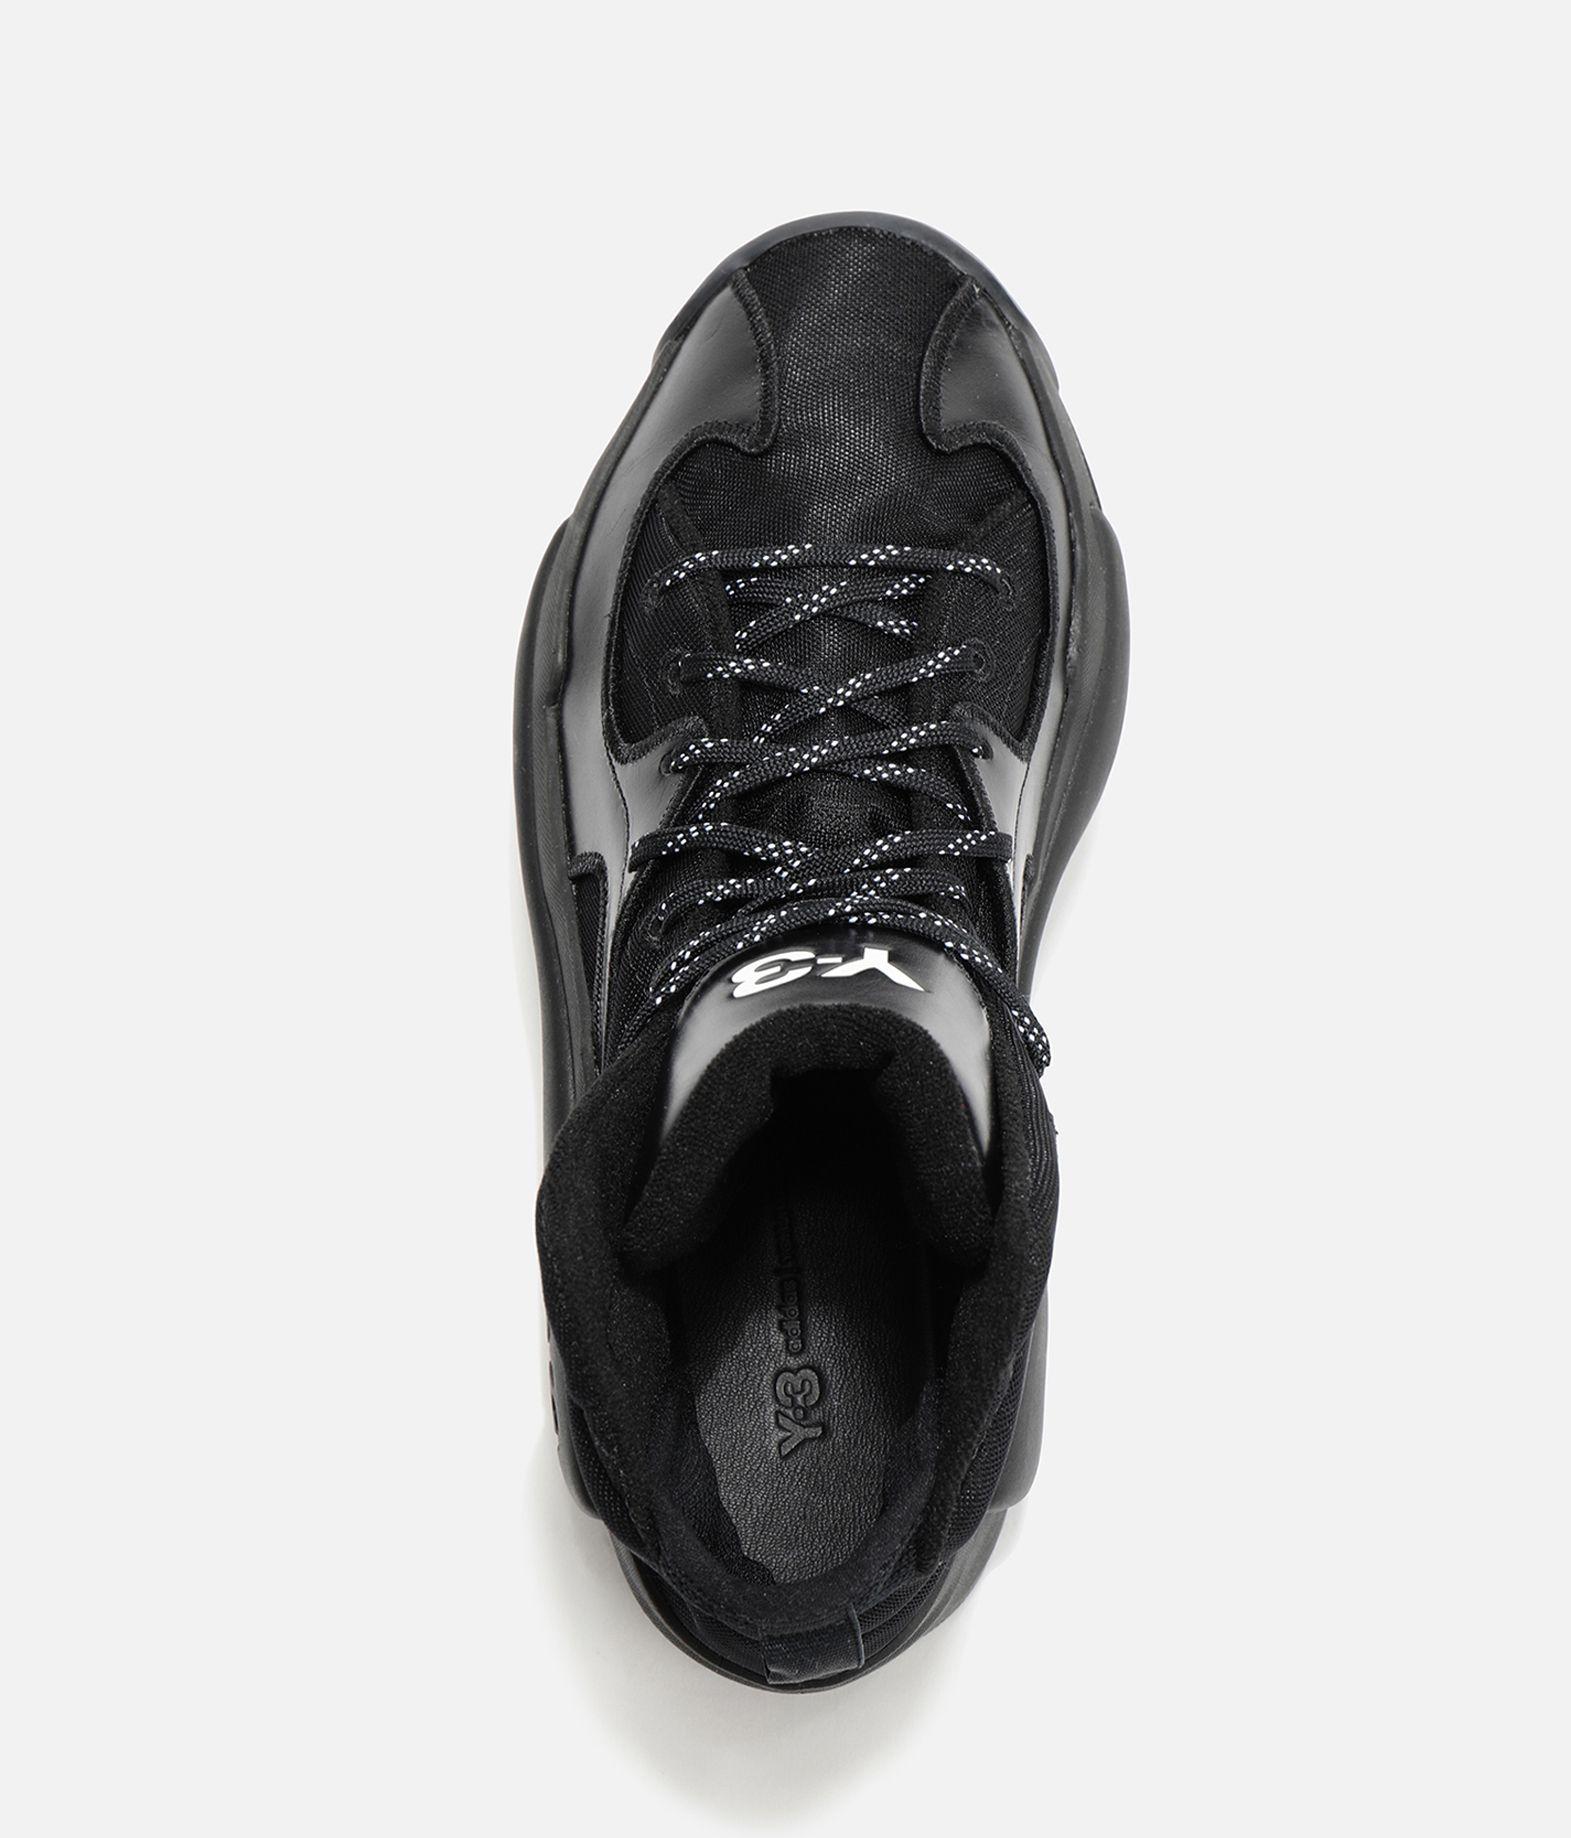 Y-3 Y-3 Hokori Sneakers Woman c